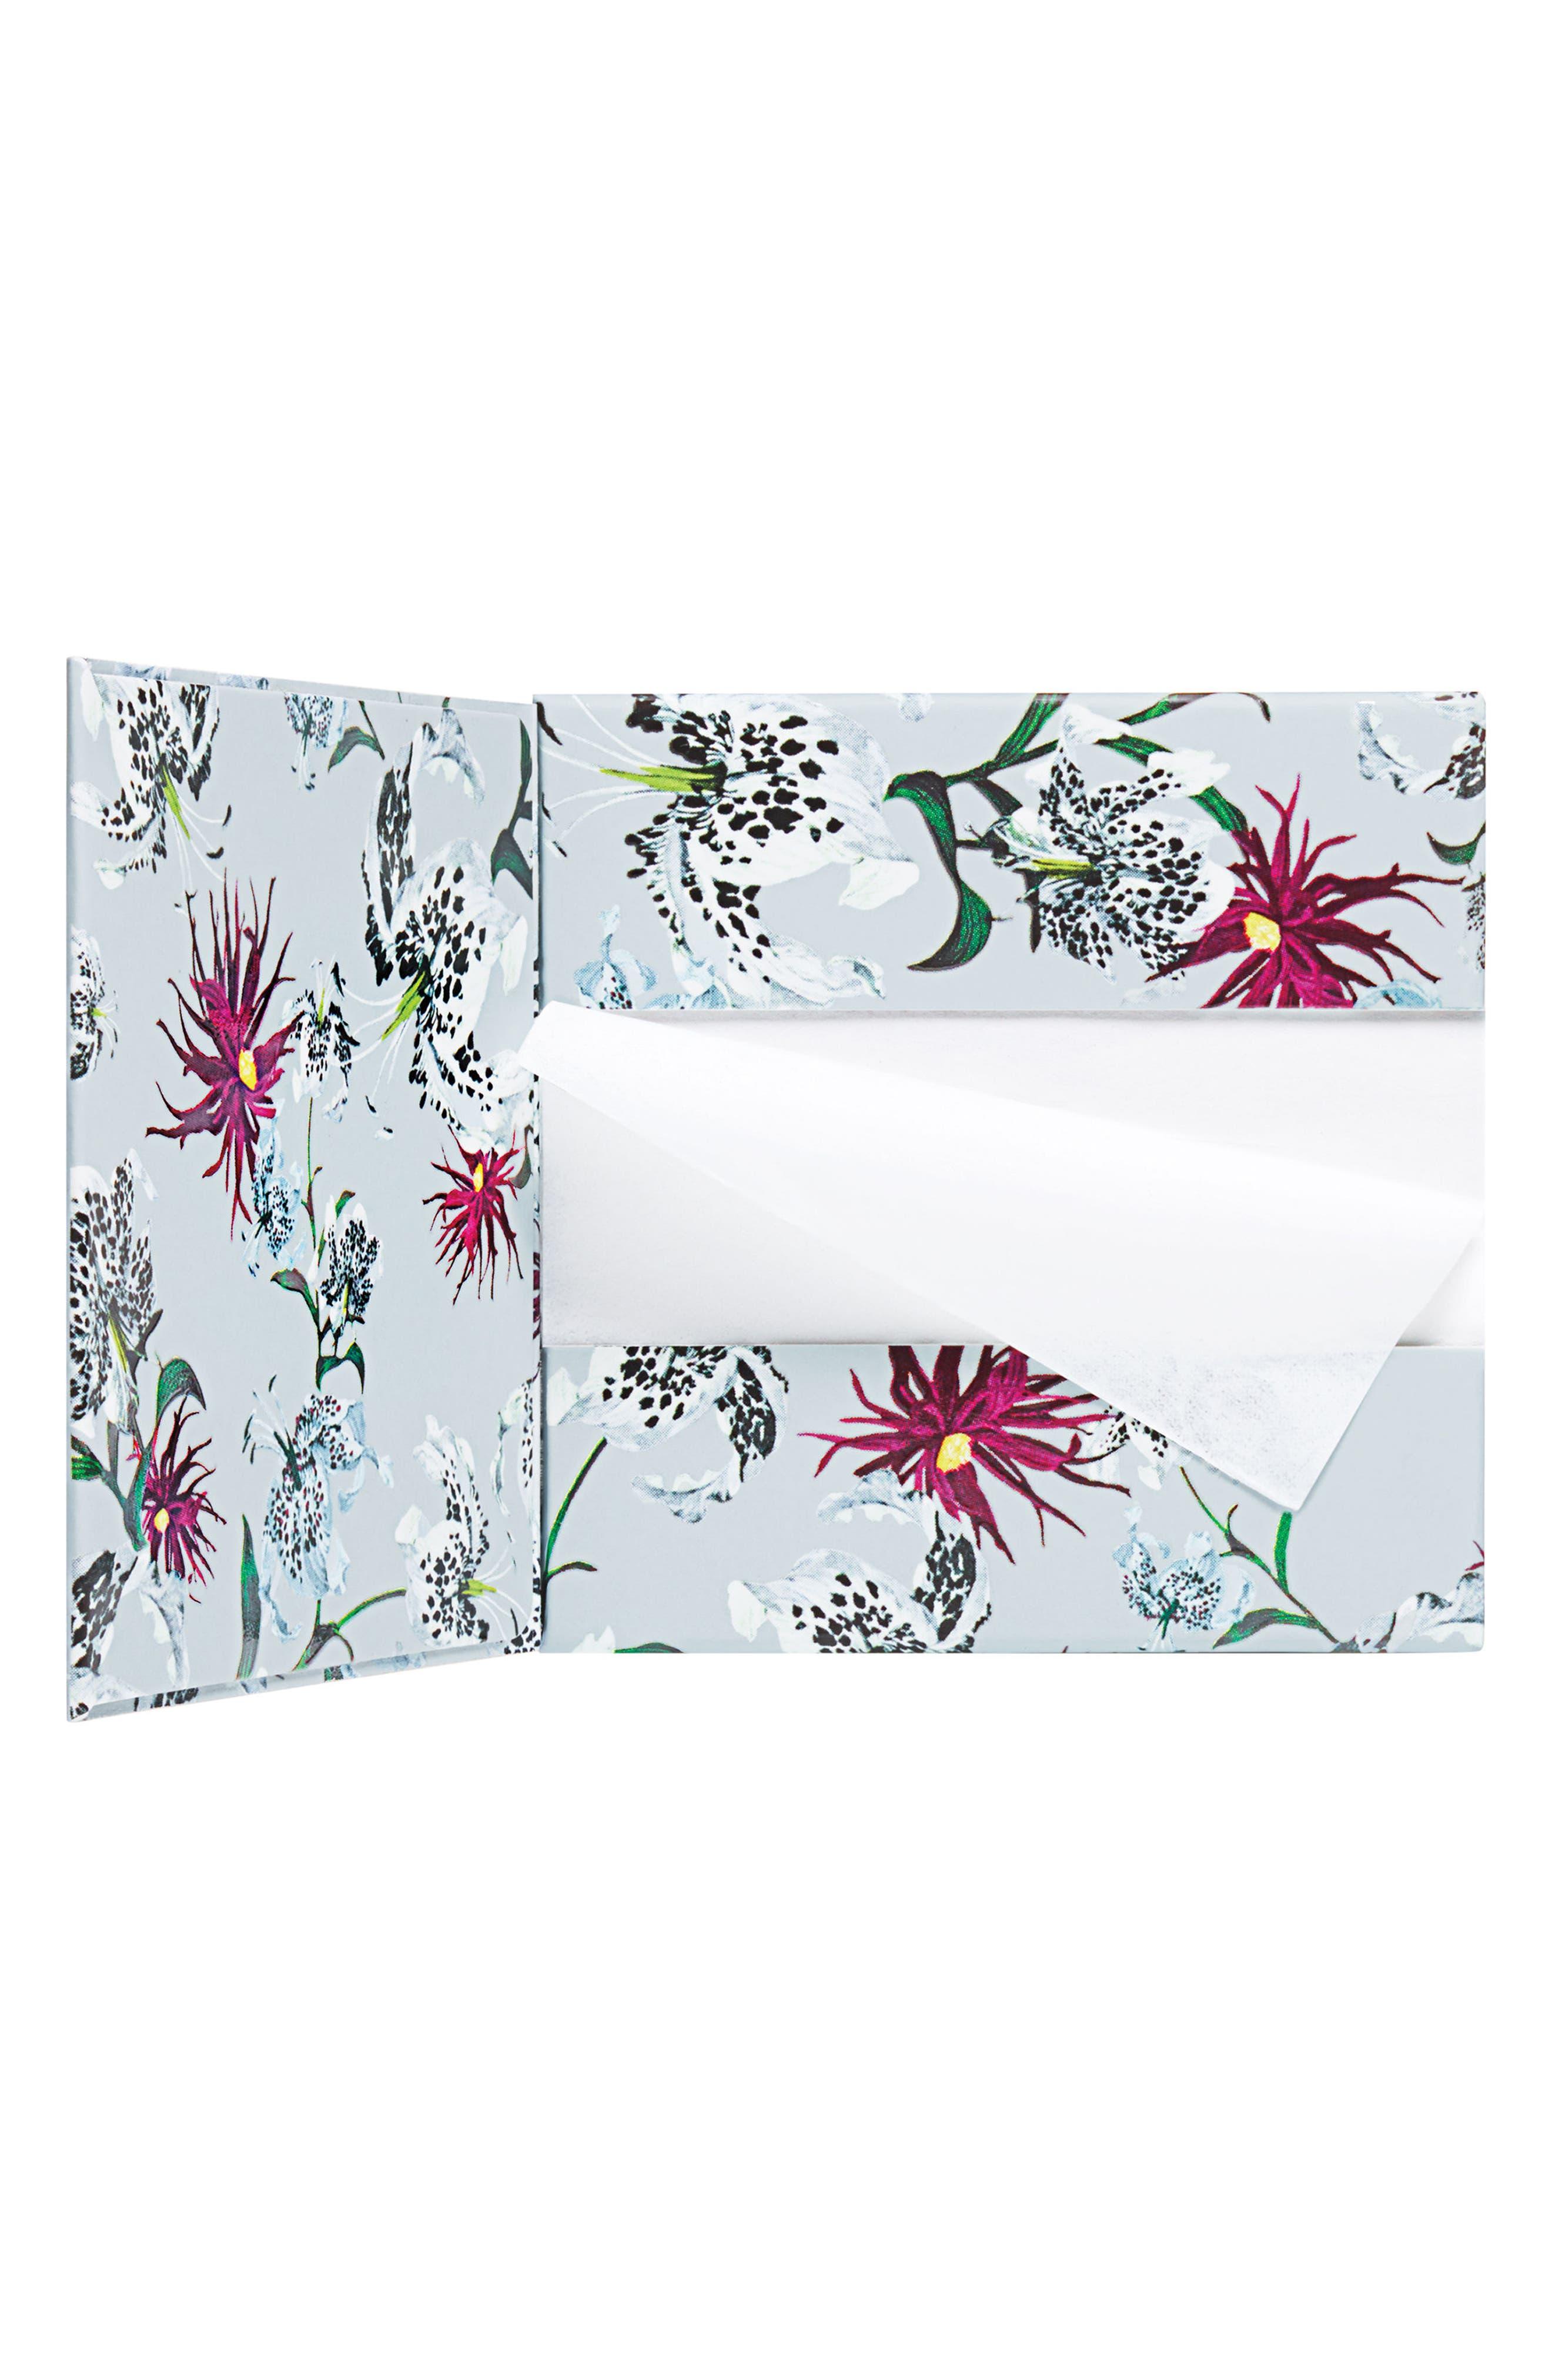 x Erdem Strange Flowers Mattifying Blotting Papers,                             Main thumbnail 1, color,                             000